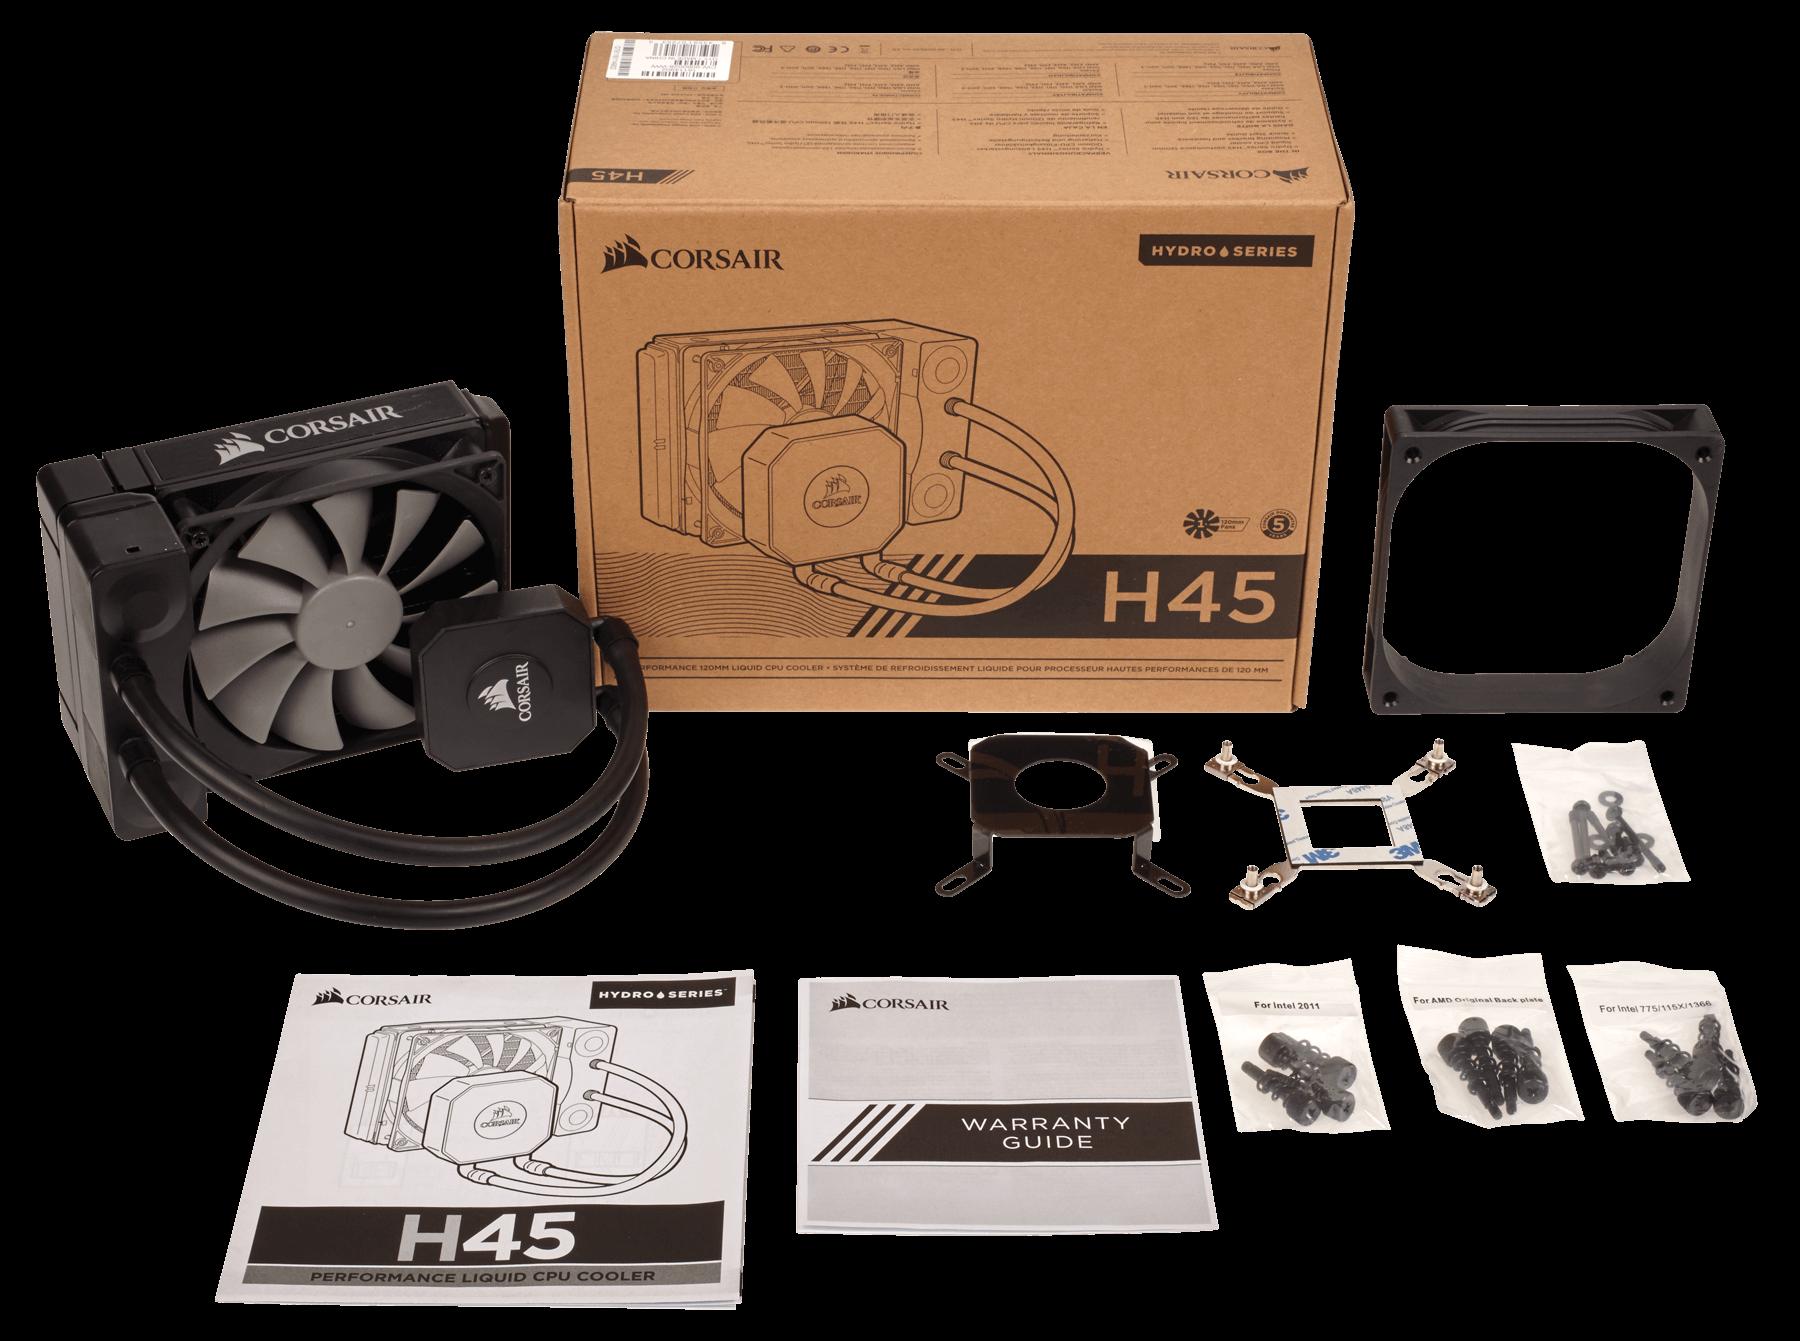 TẢN NHIỆT CORSAIR - CPU Hydro Cooler H45 - 120mm - Single - CW-9060028-WW